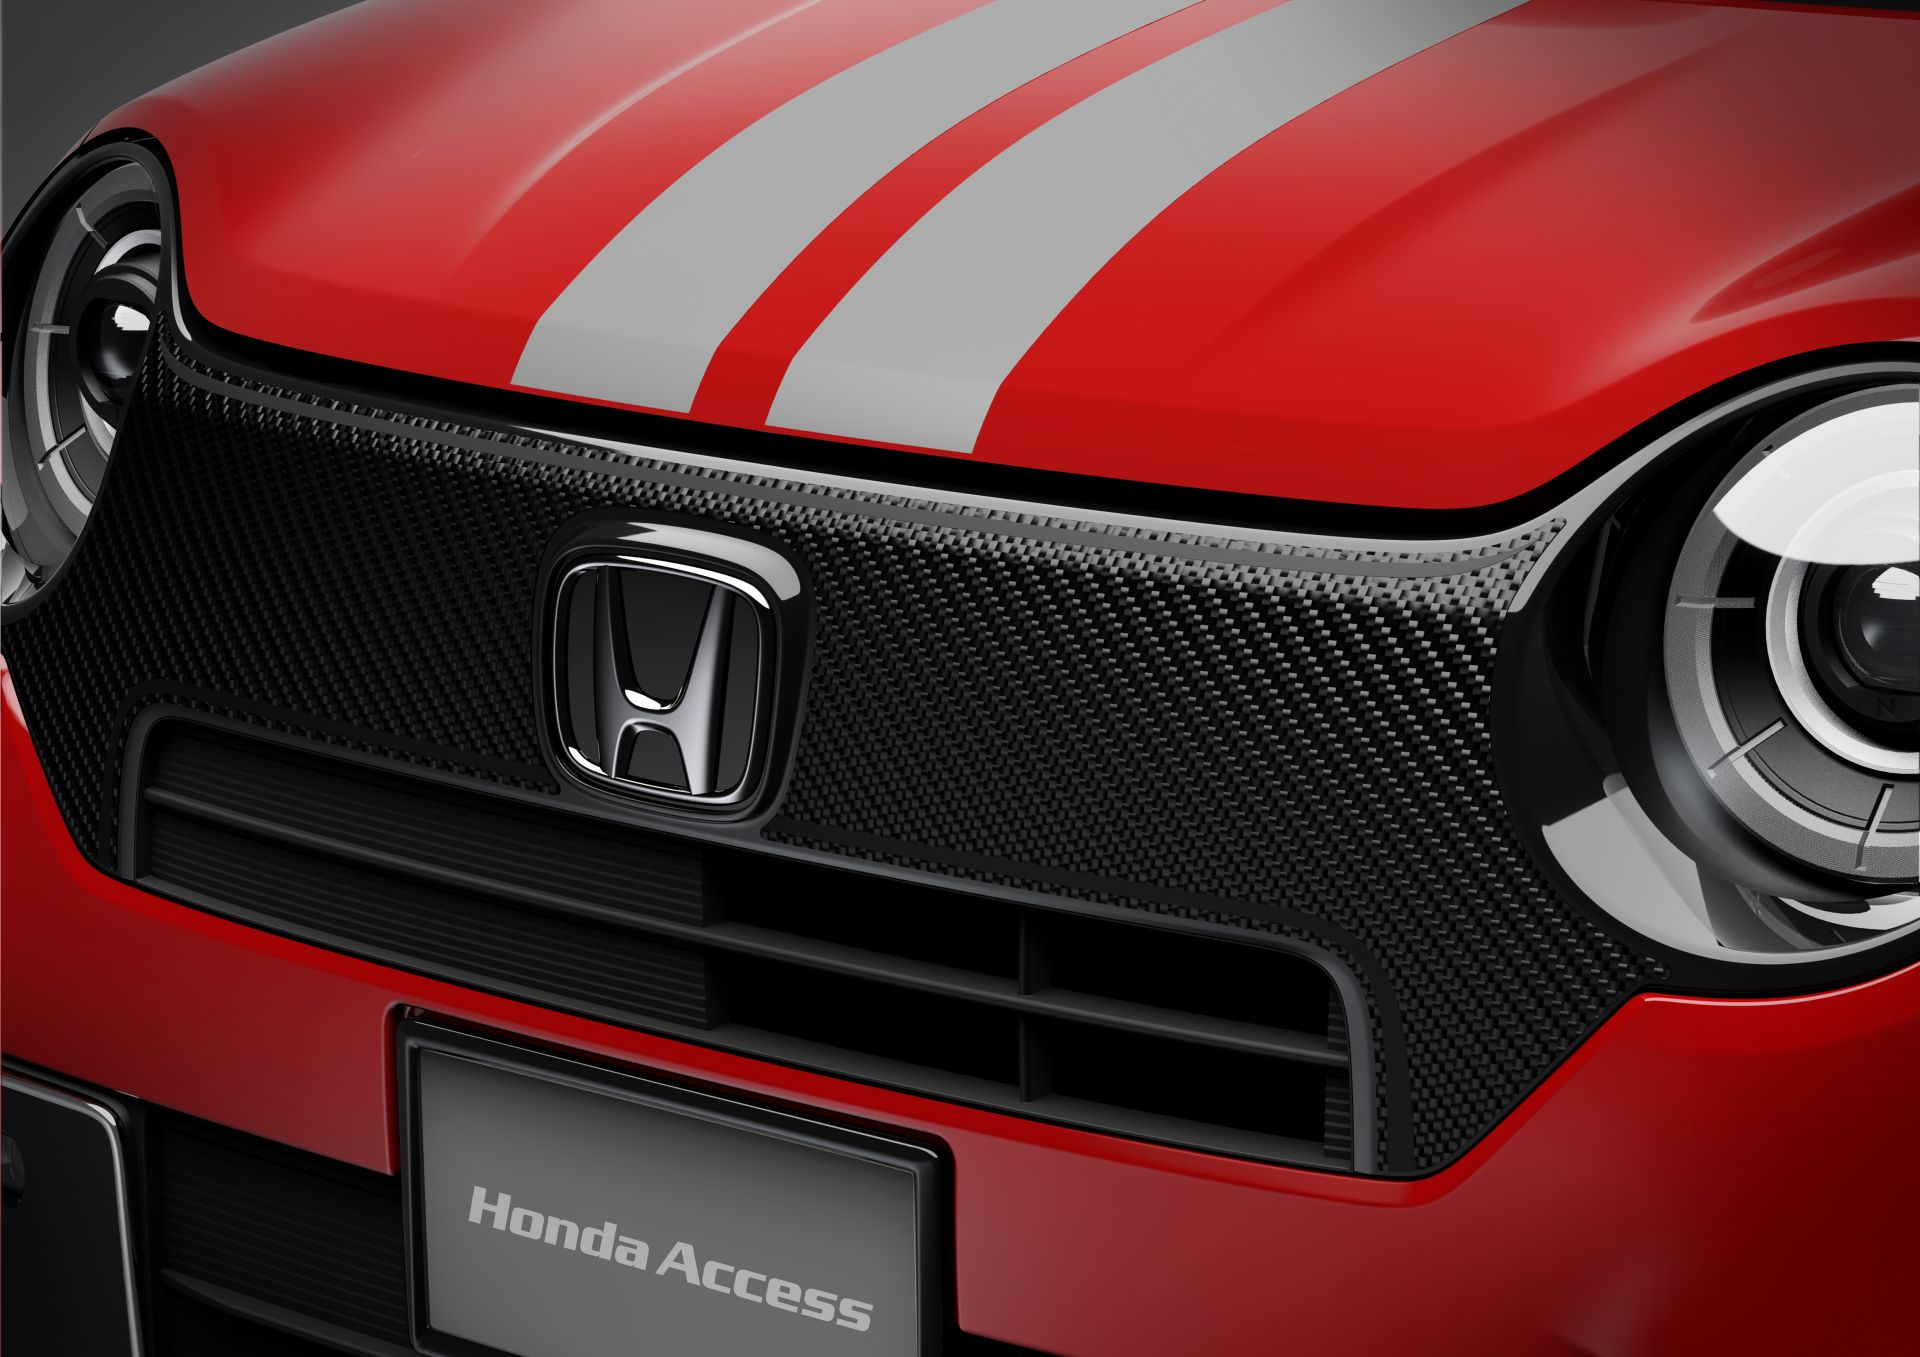 Honda-Access-for-2021-N-One-JDM-spec-2